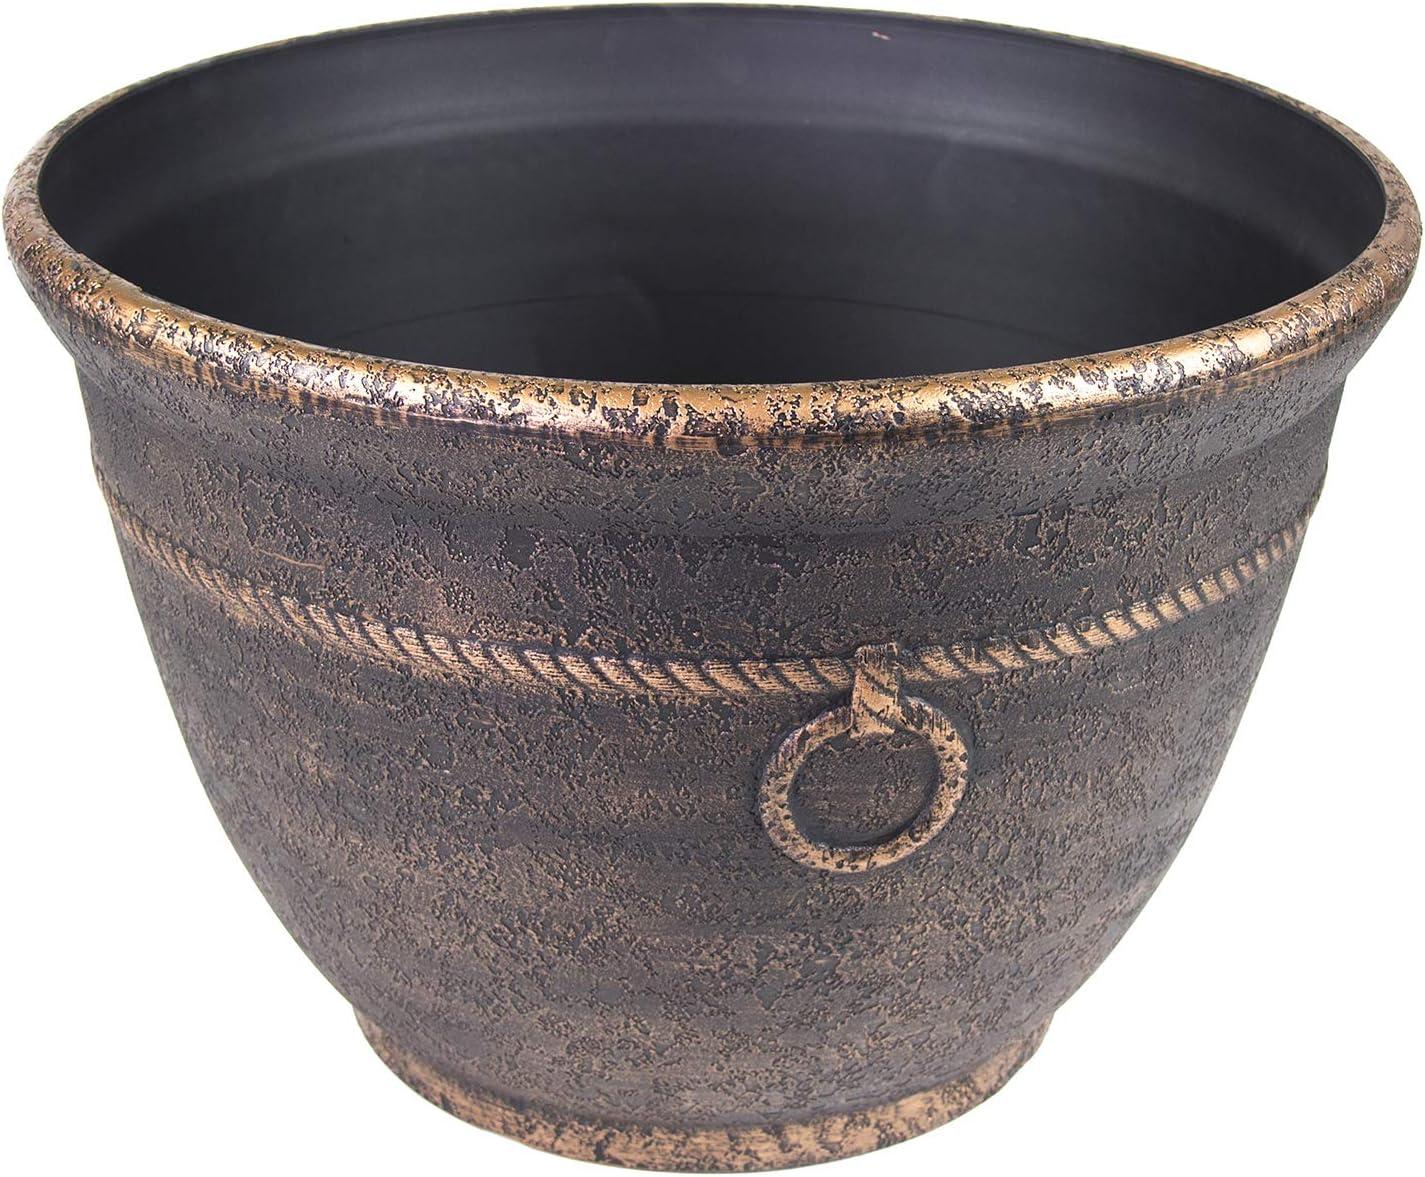 Liberty Garden 1925 High Density Resin Banded Hose Pot, Antique Bronze